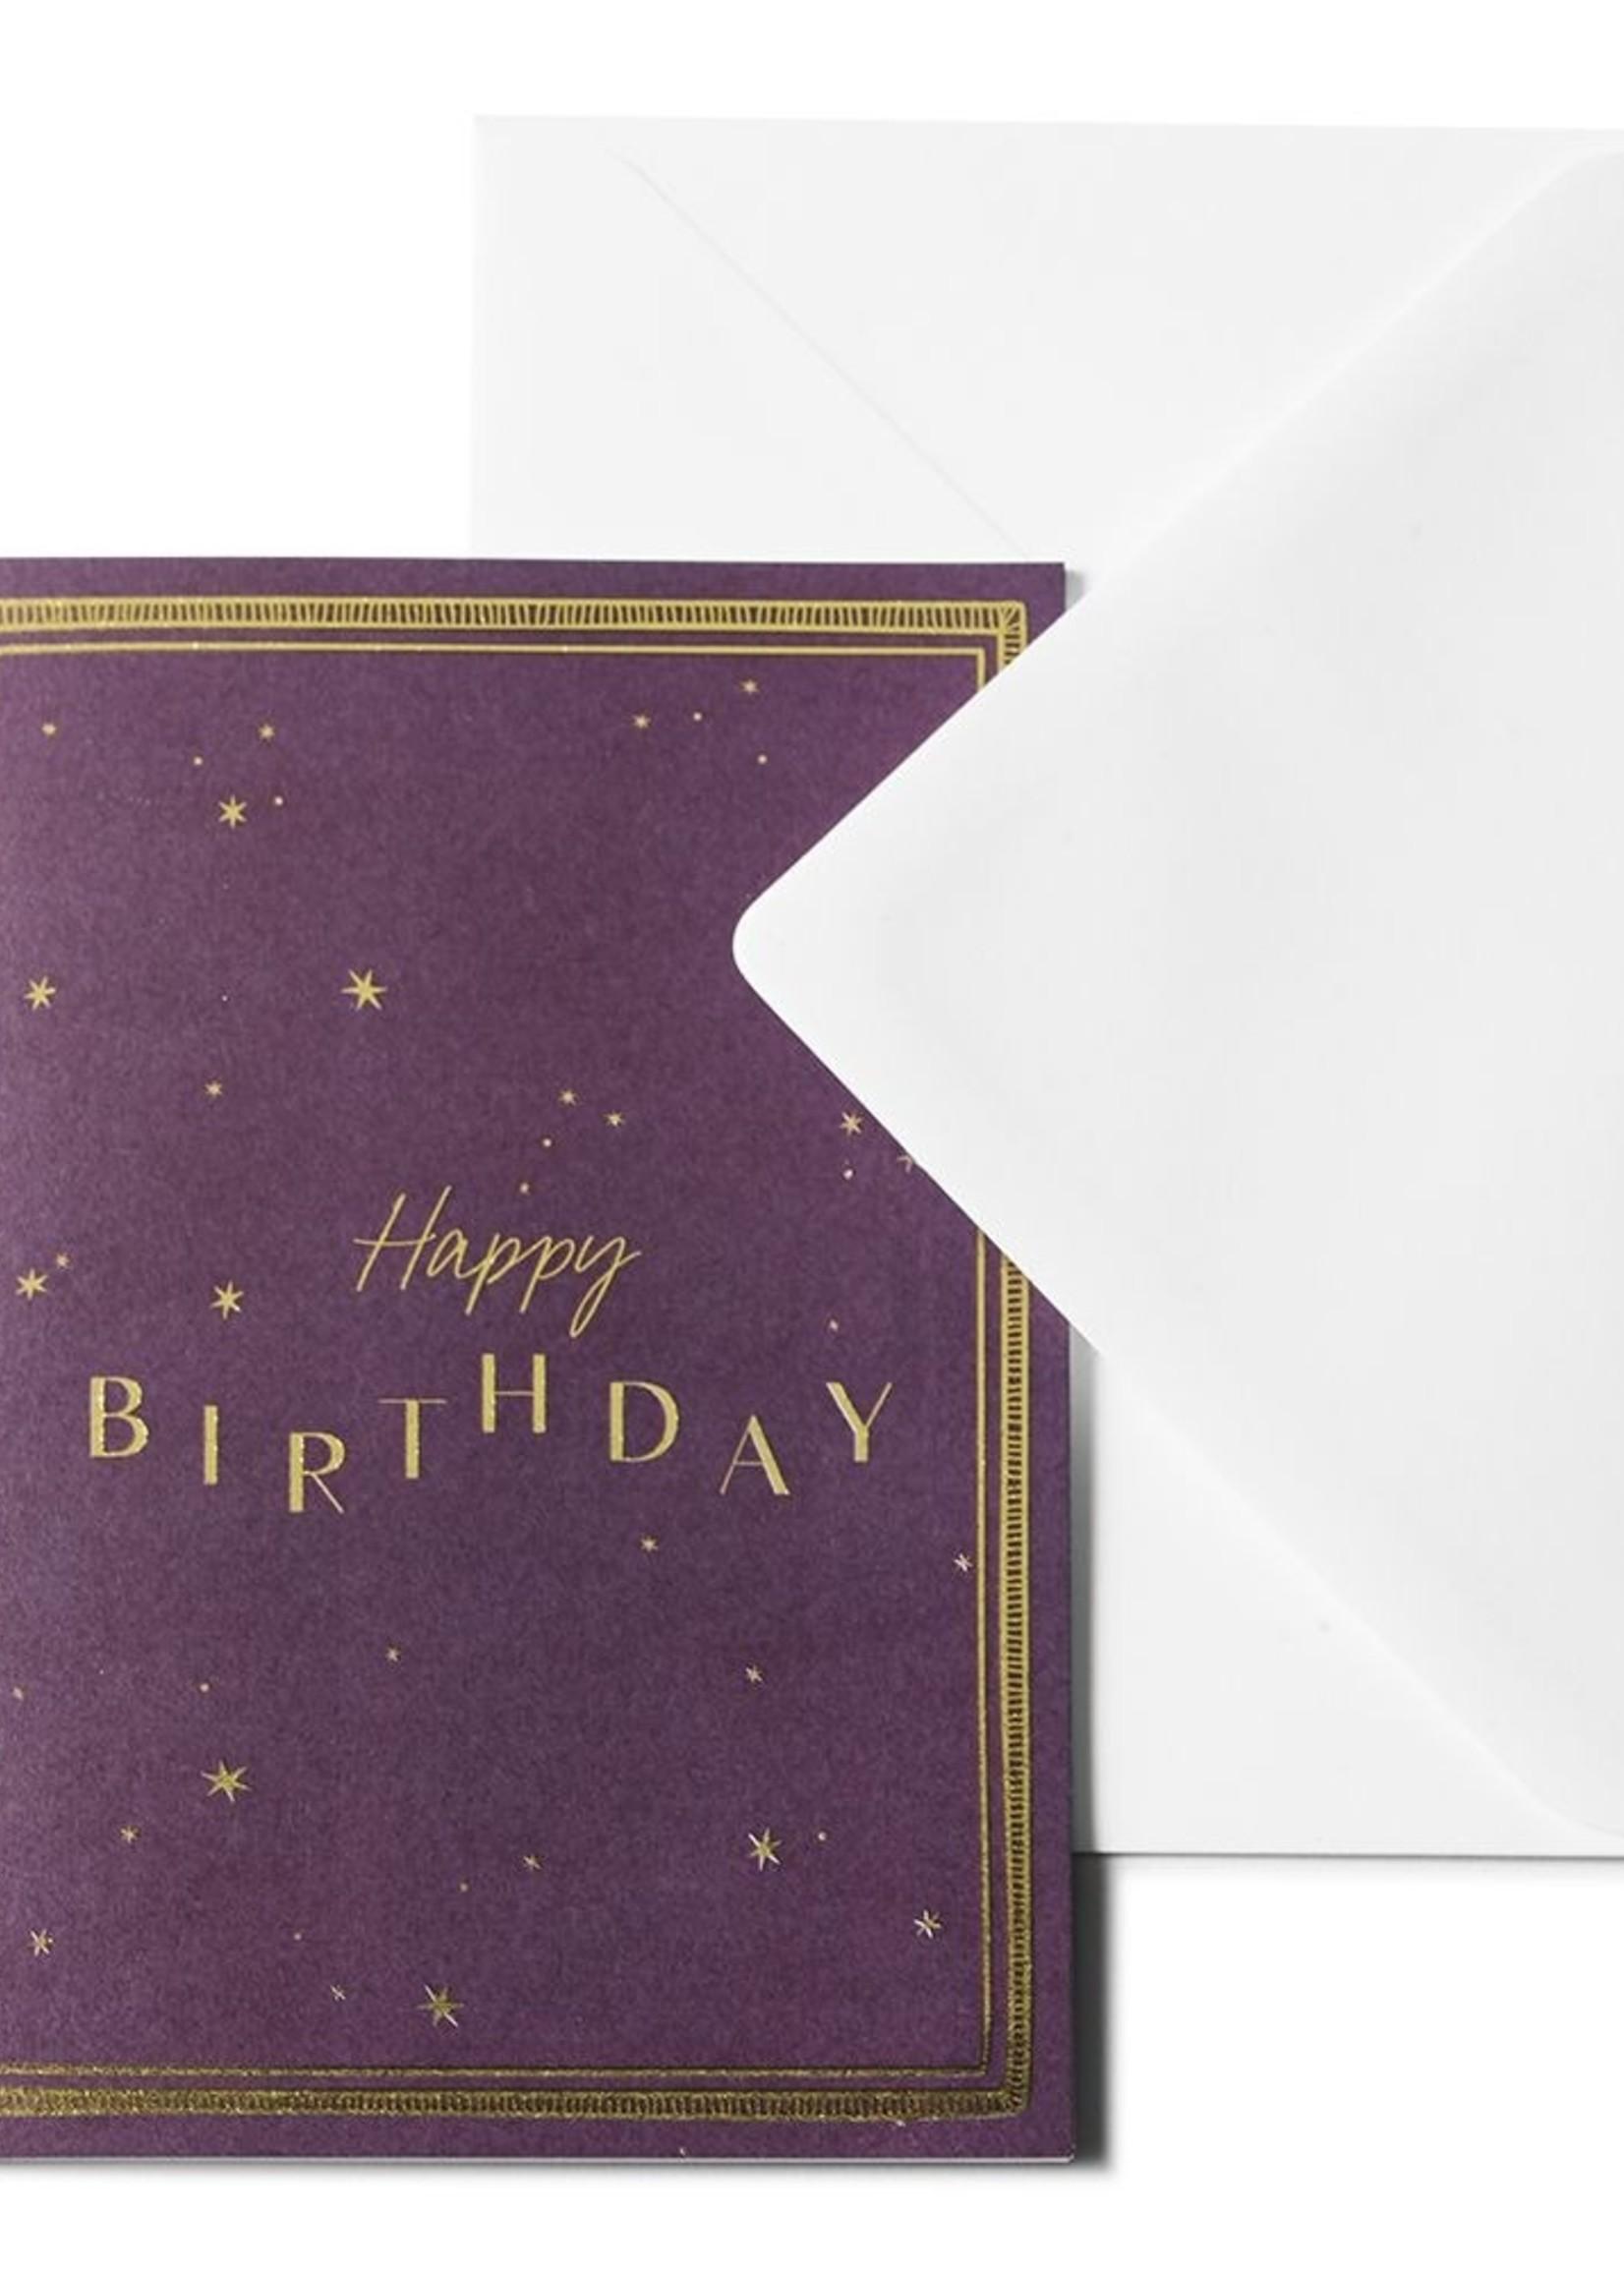 Me & Mats Me & Mats Greeting Card Happy Birthday